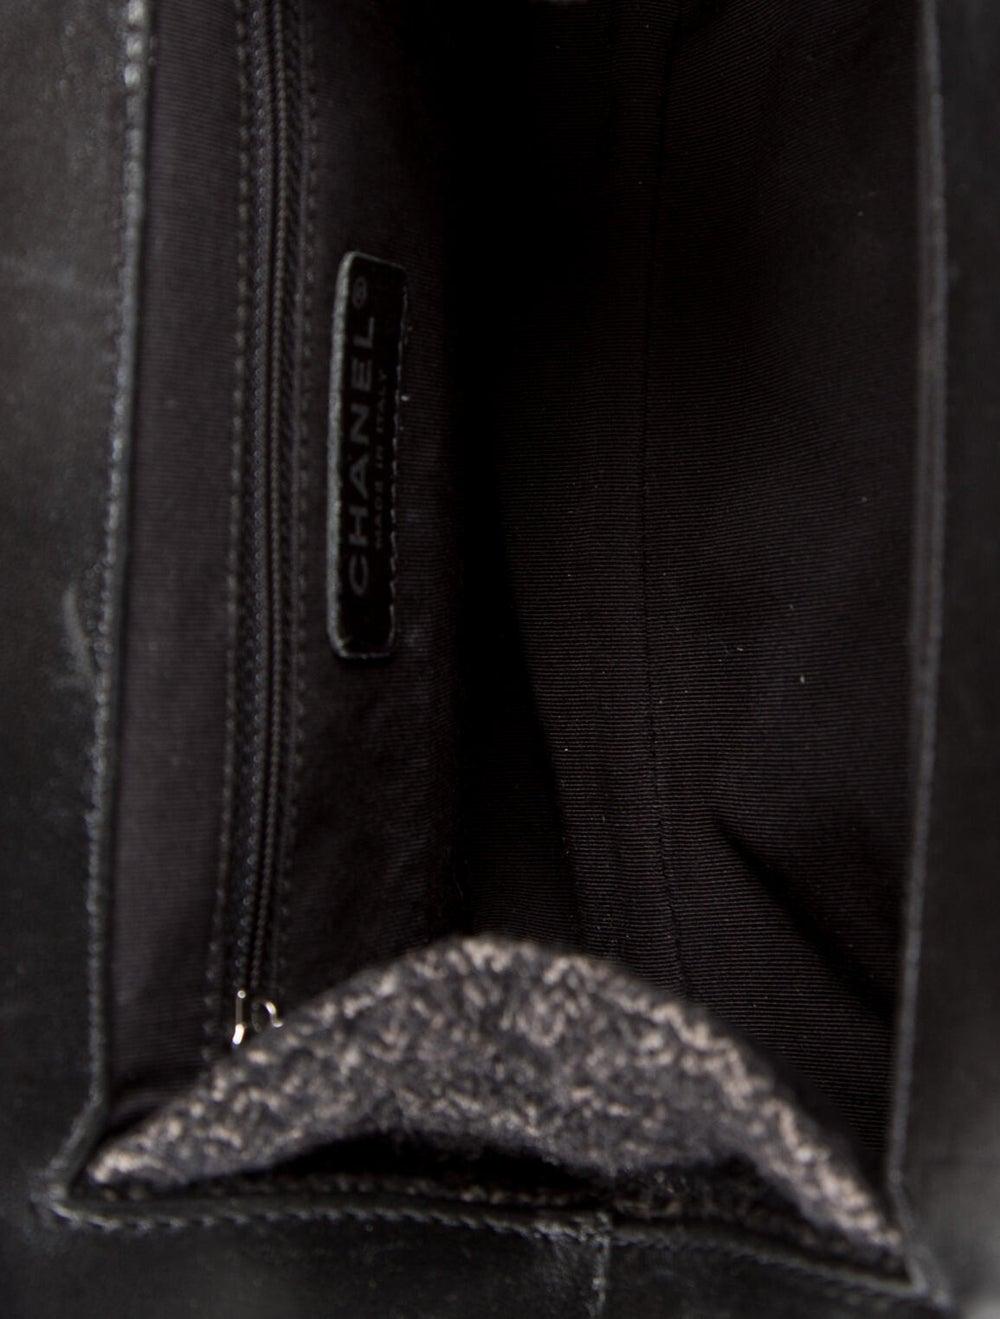 Chanel Tweed Frame Bag Brown - image 5